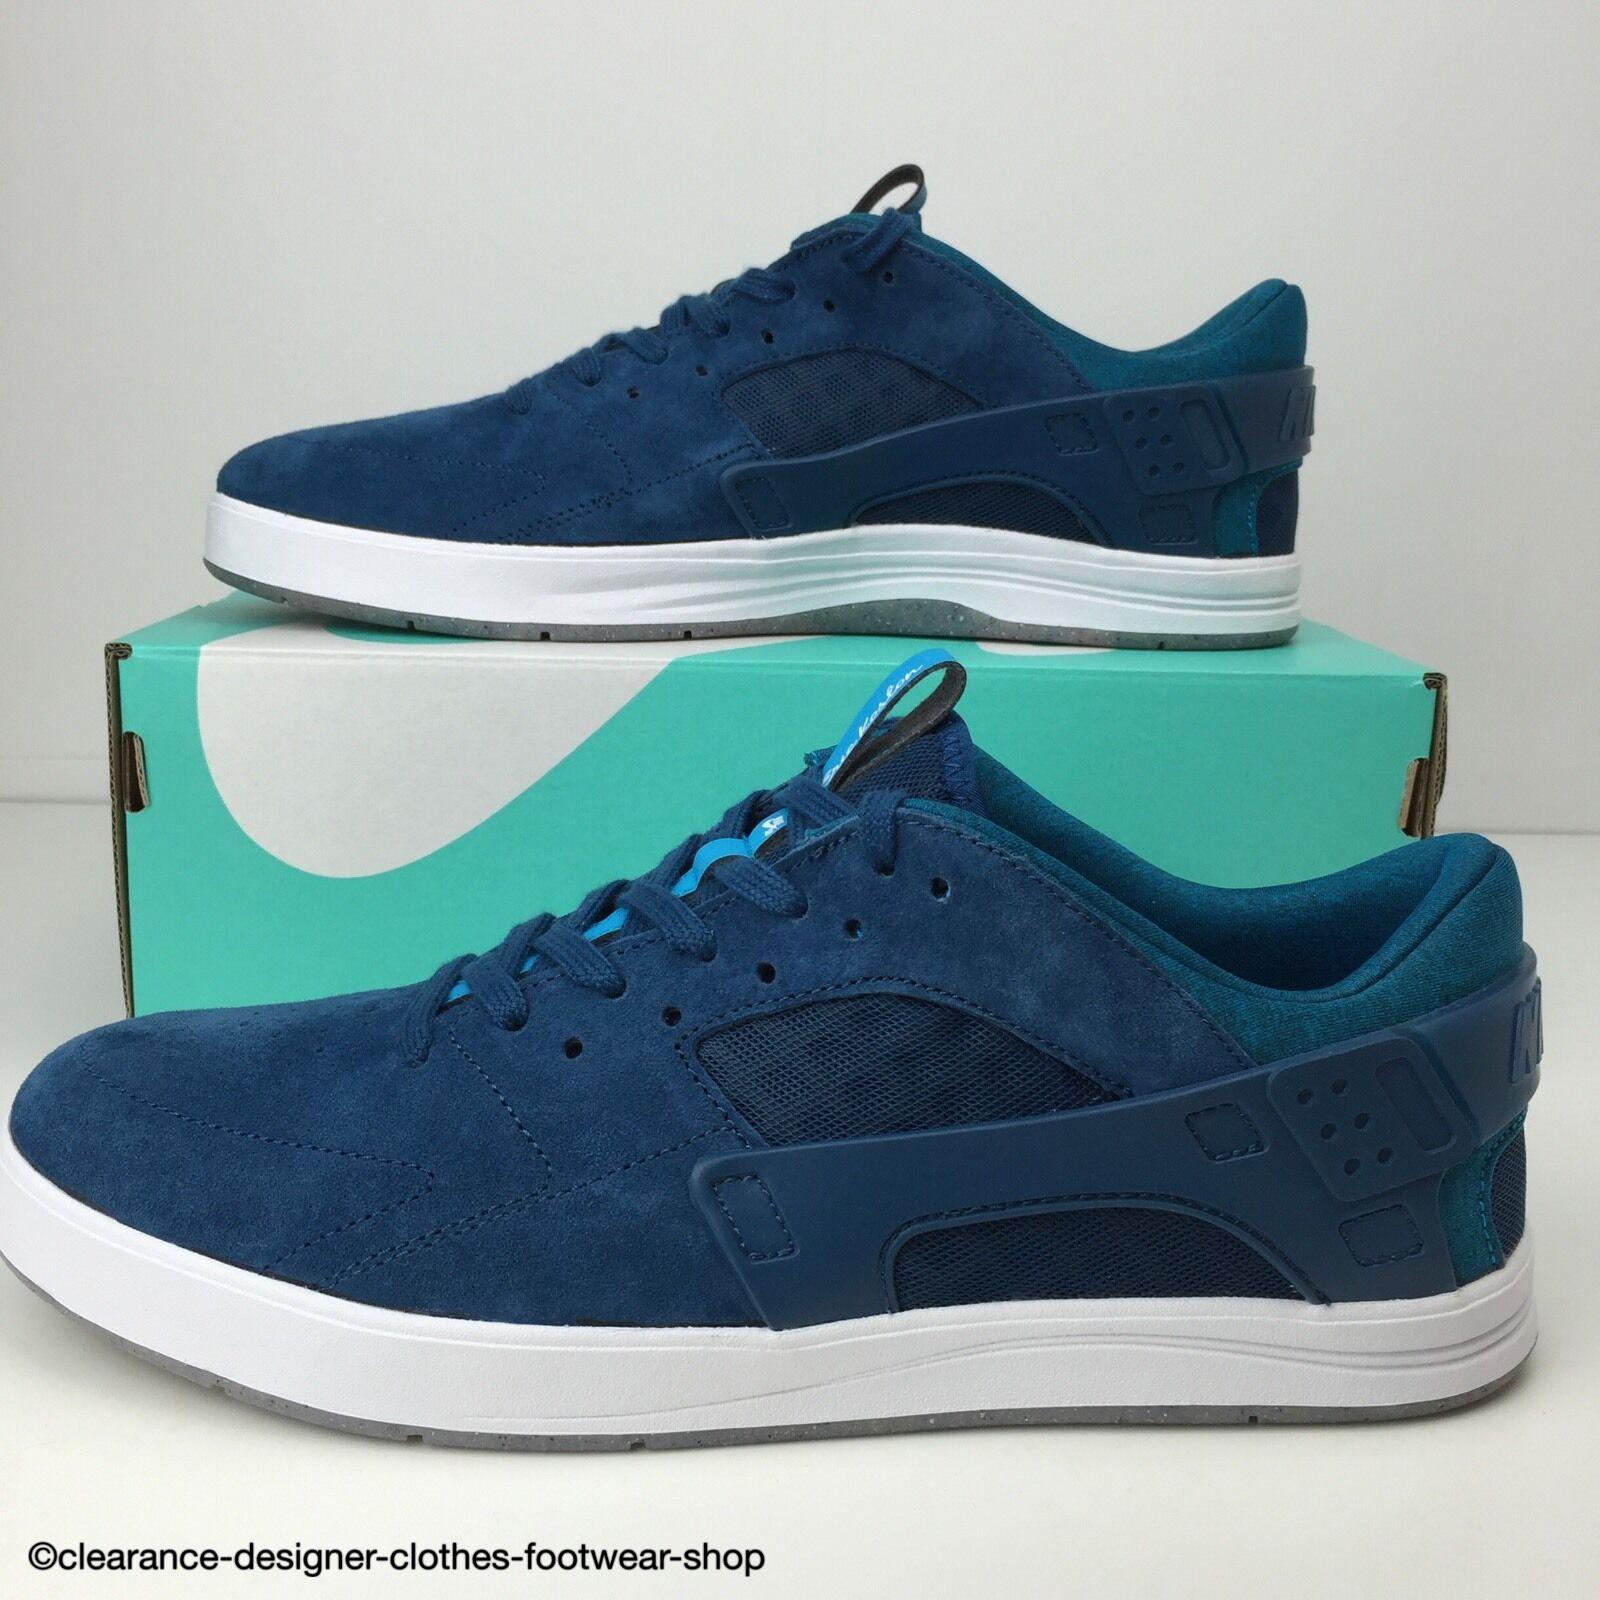 NIKE ERIC KOSTON HUARACHE TRAINERS NEW NIKE SB SKATE Chaussures 10.5